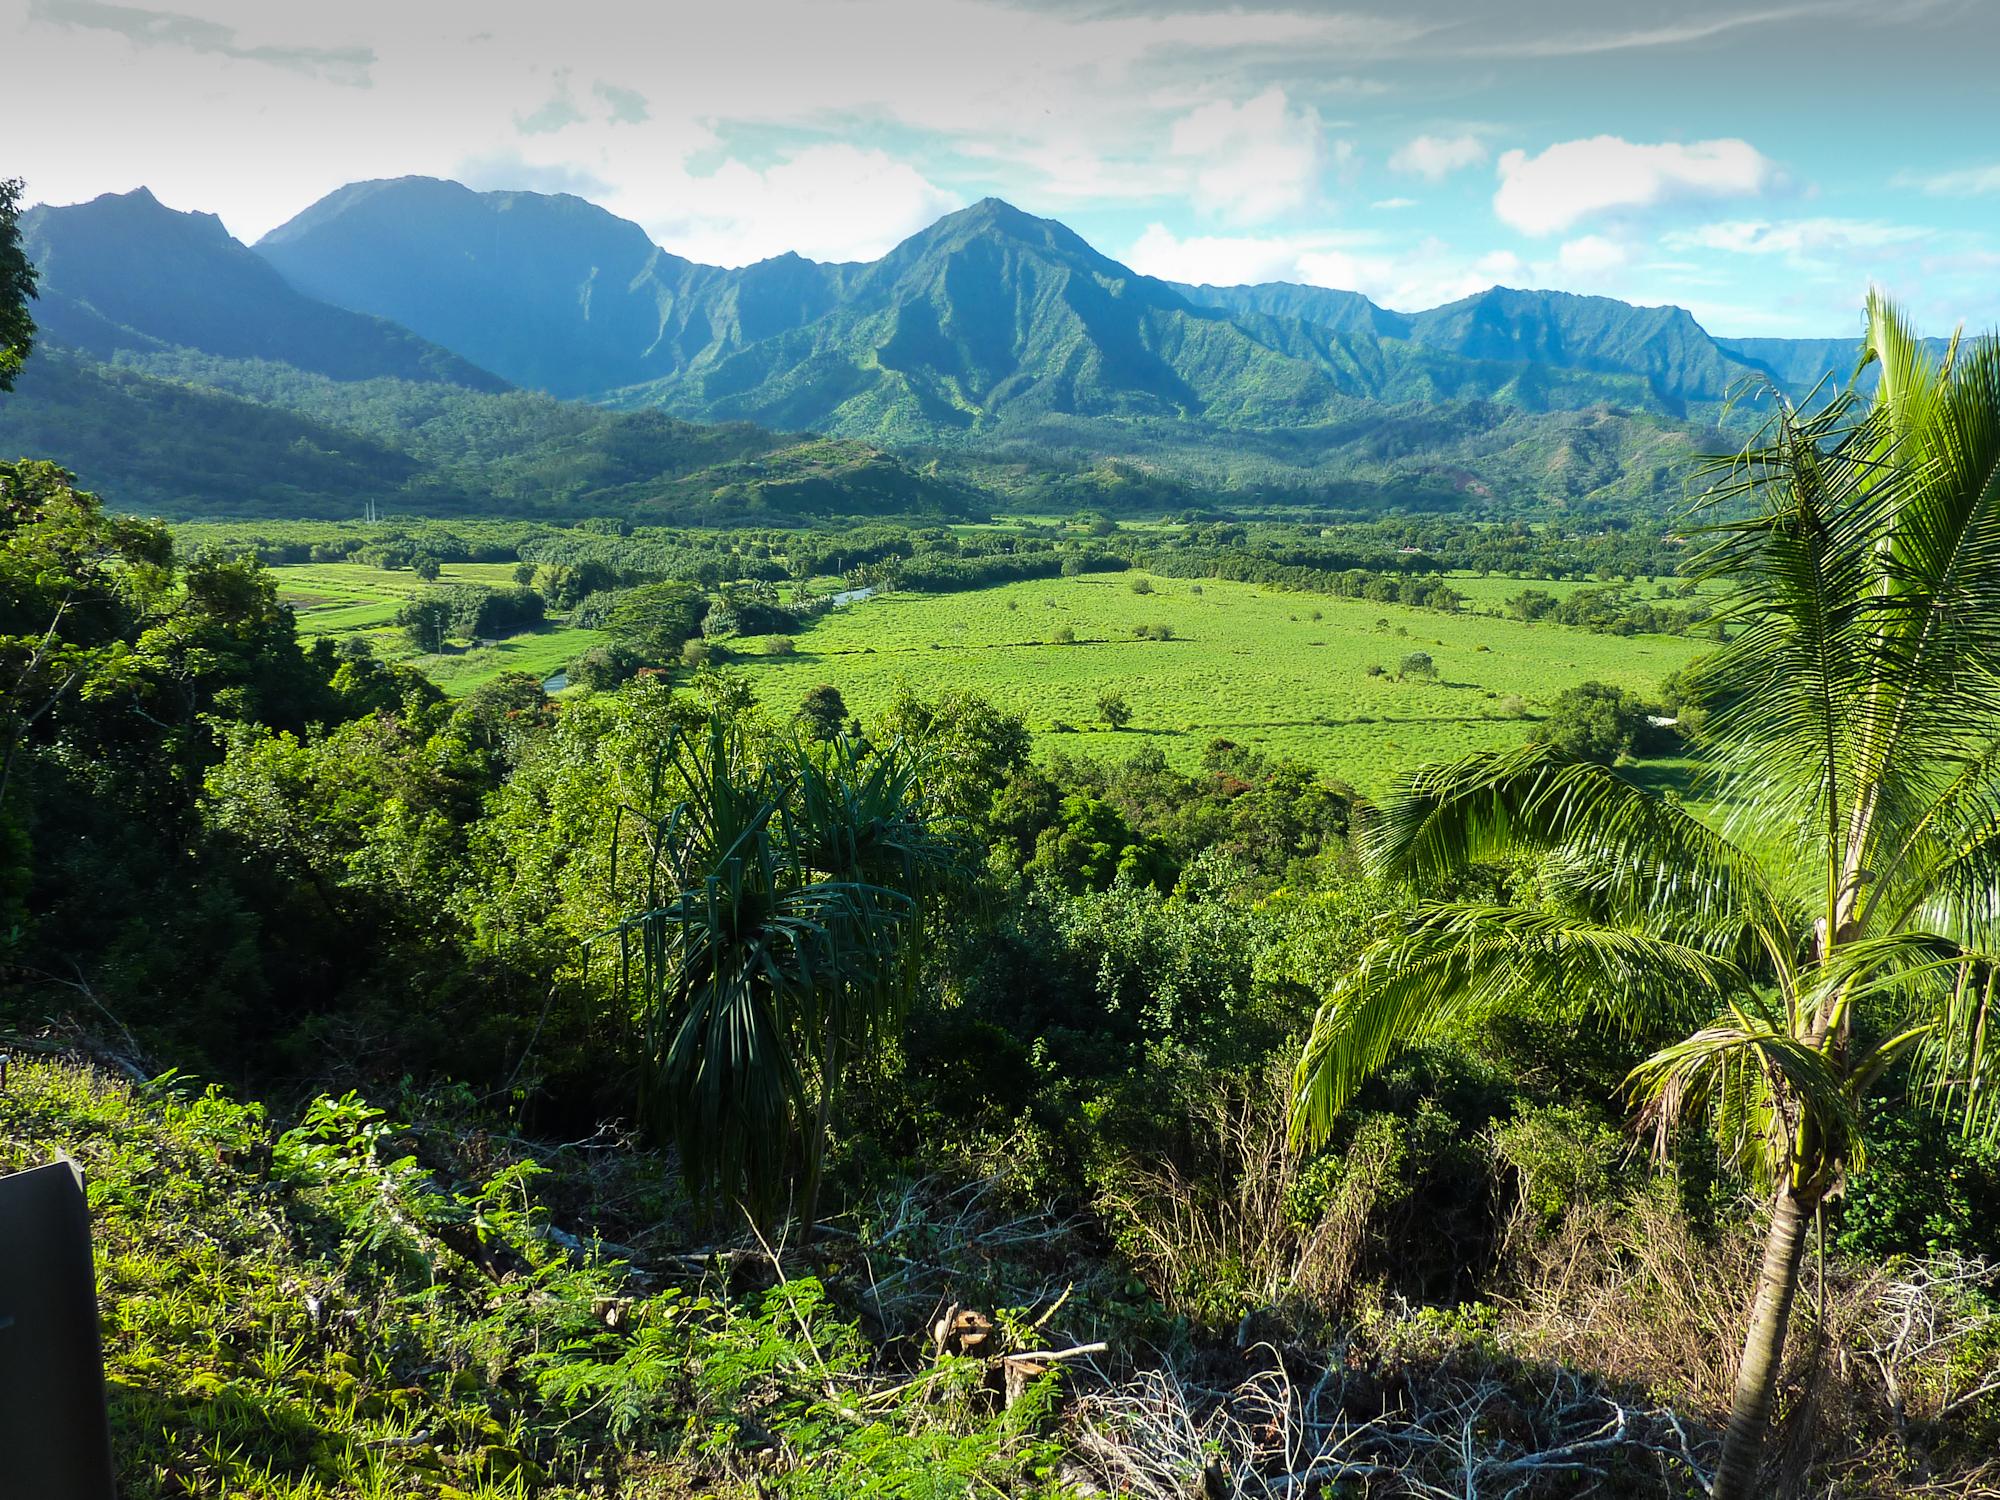 dateitypical kauai scenery 8034635778jpg � wikipedia